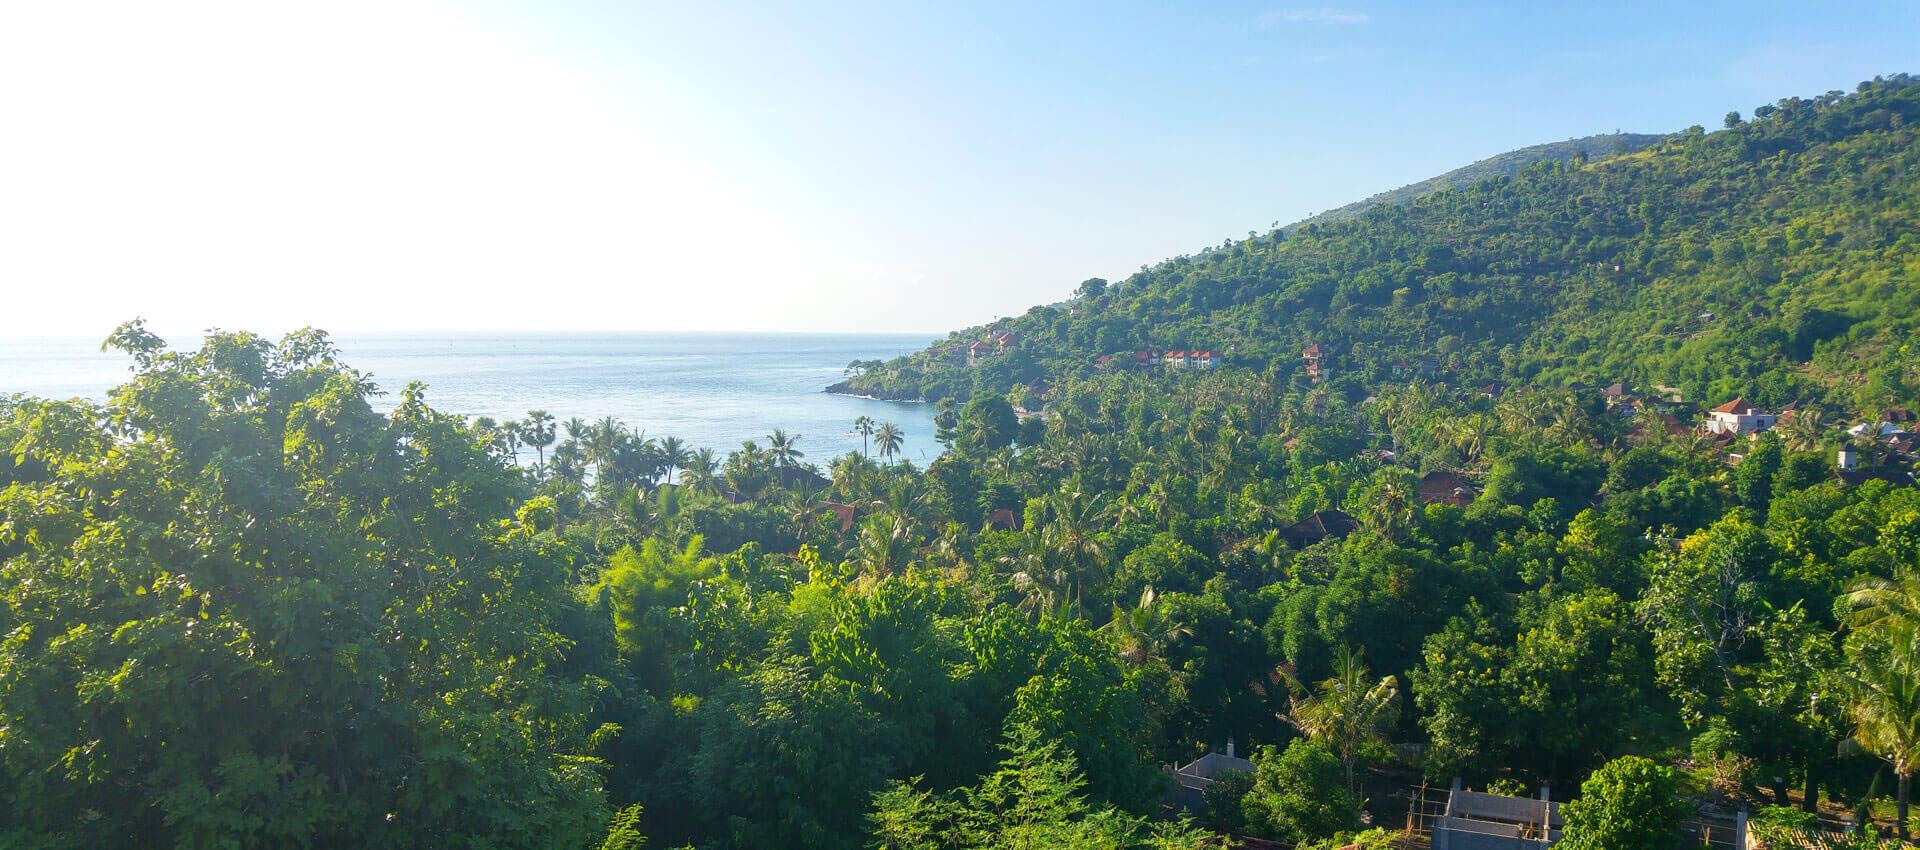 Beach, palmtrees and jungle in Bali